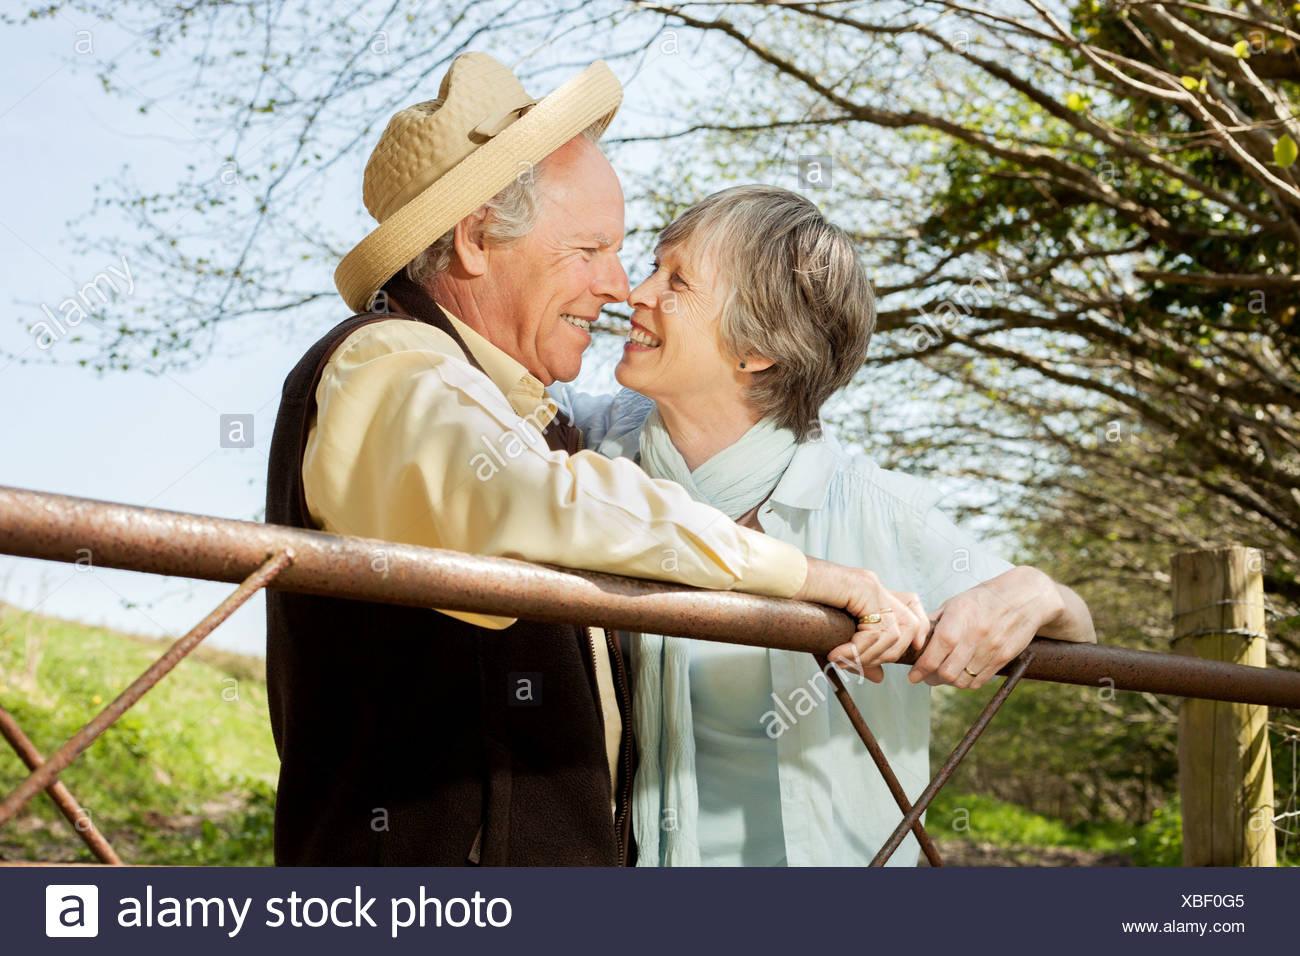 Senior couple nose to nose - Stock Image